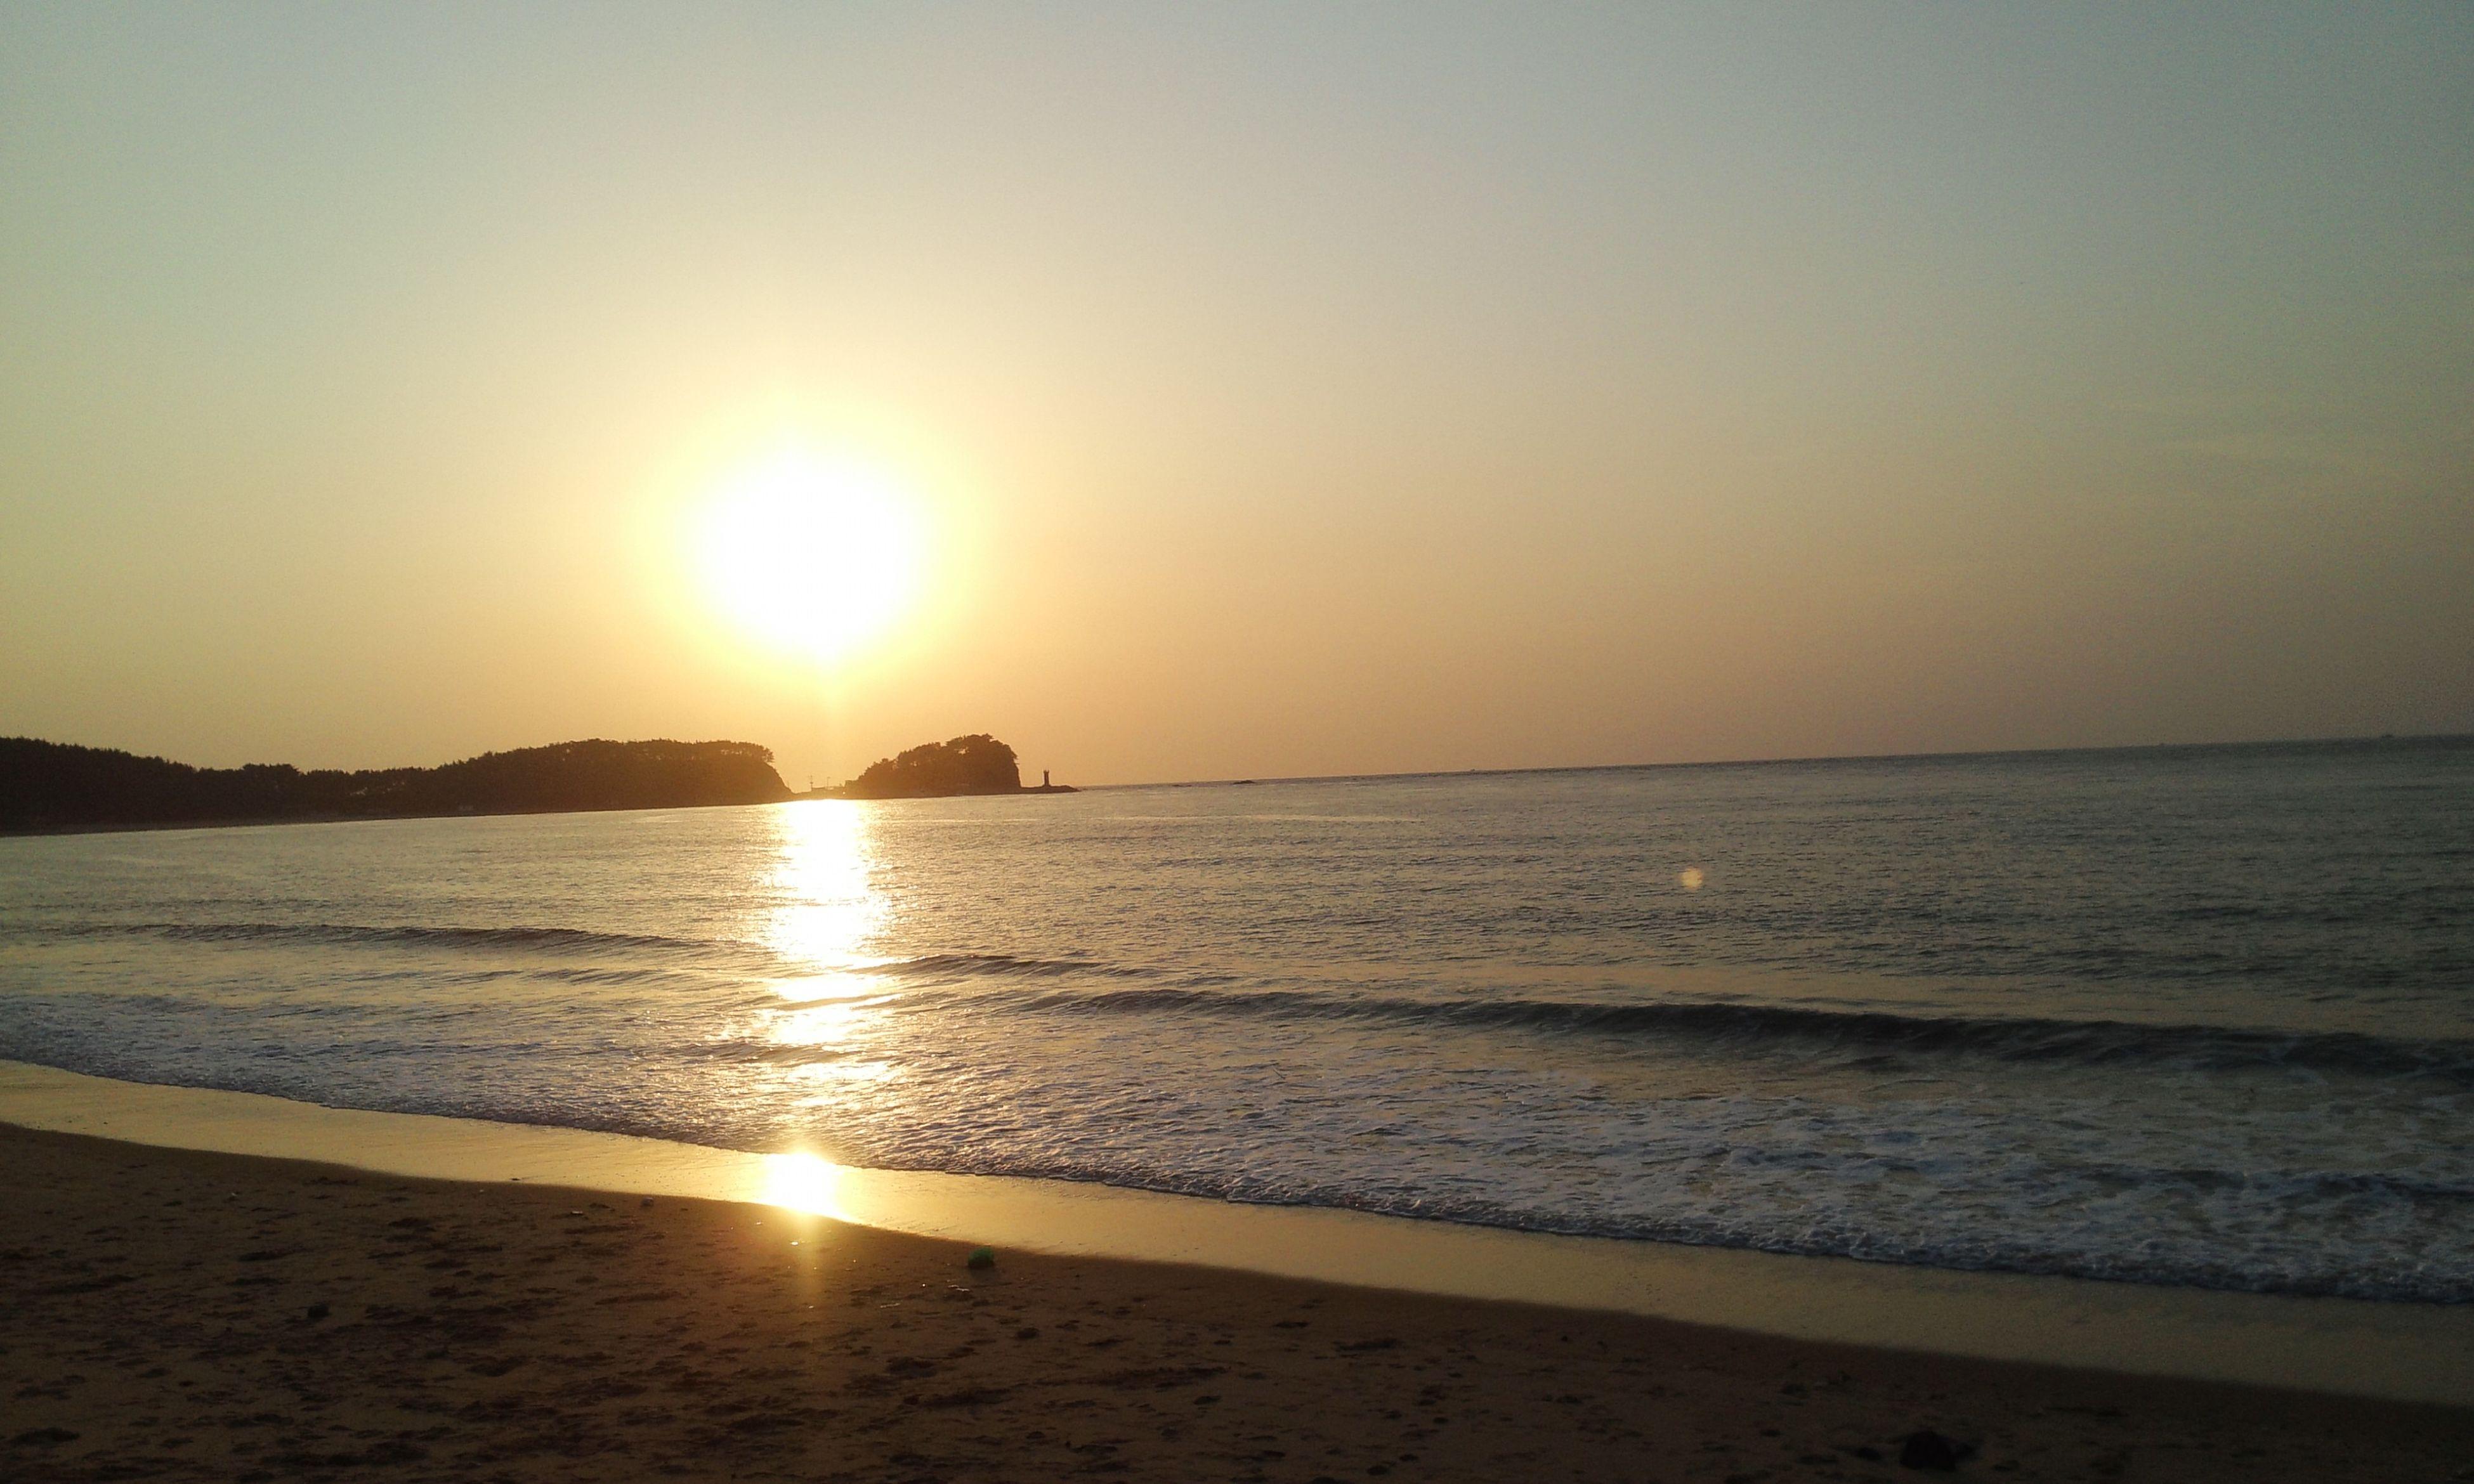 sea, sun, water, sunset, beach, horizon over water, scenics, tranquil scene, tranquility, beauty in nature, shore, reflection, sunlight, clear sky, idyllic, nature, sand, sky, sunbeam, orange color